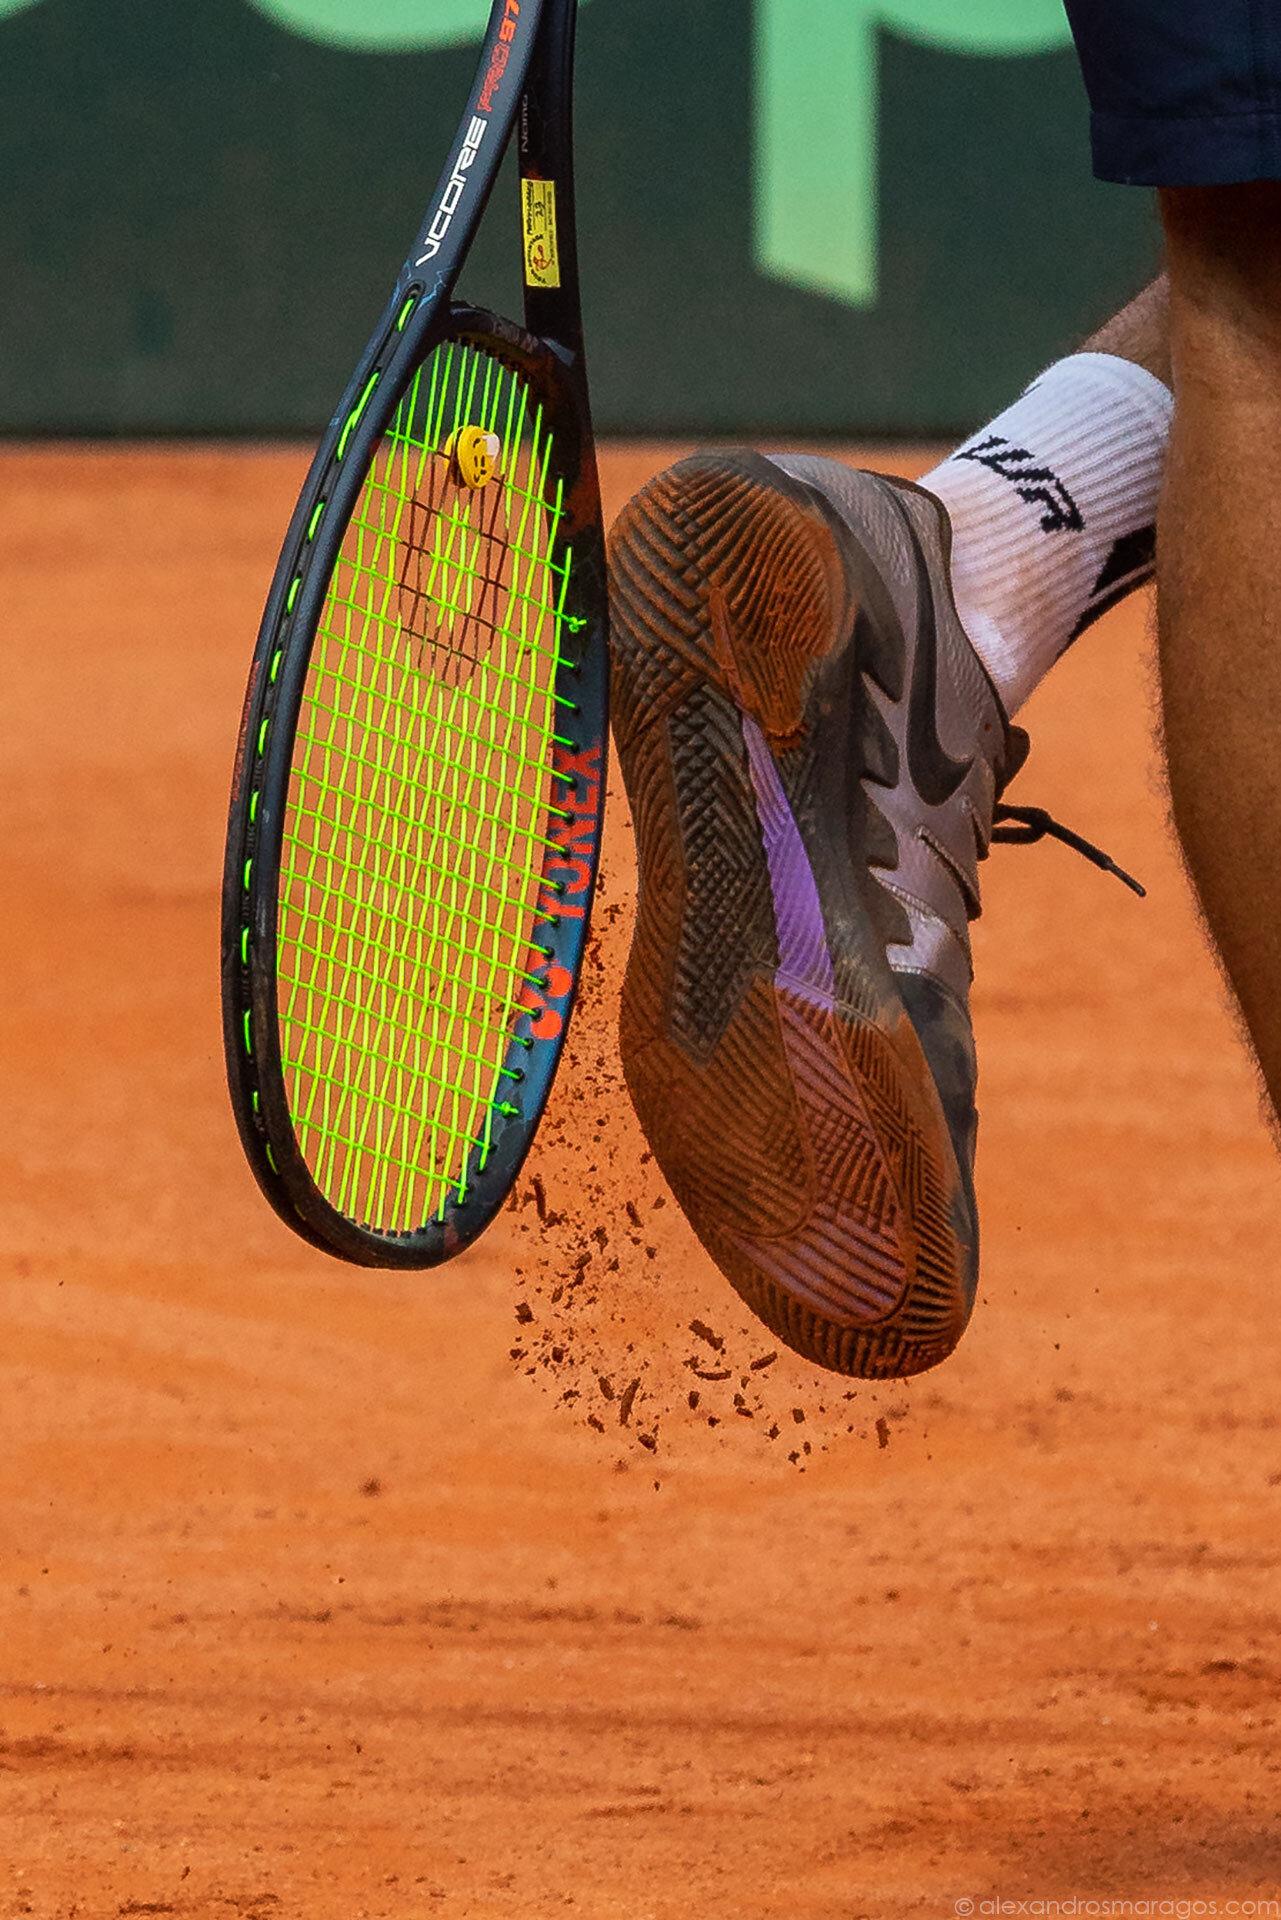 alexandros-maragos-sports-photography-tennis.jpg